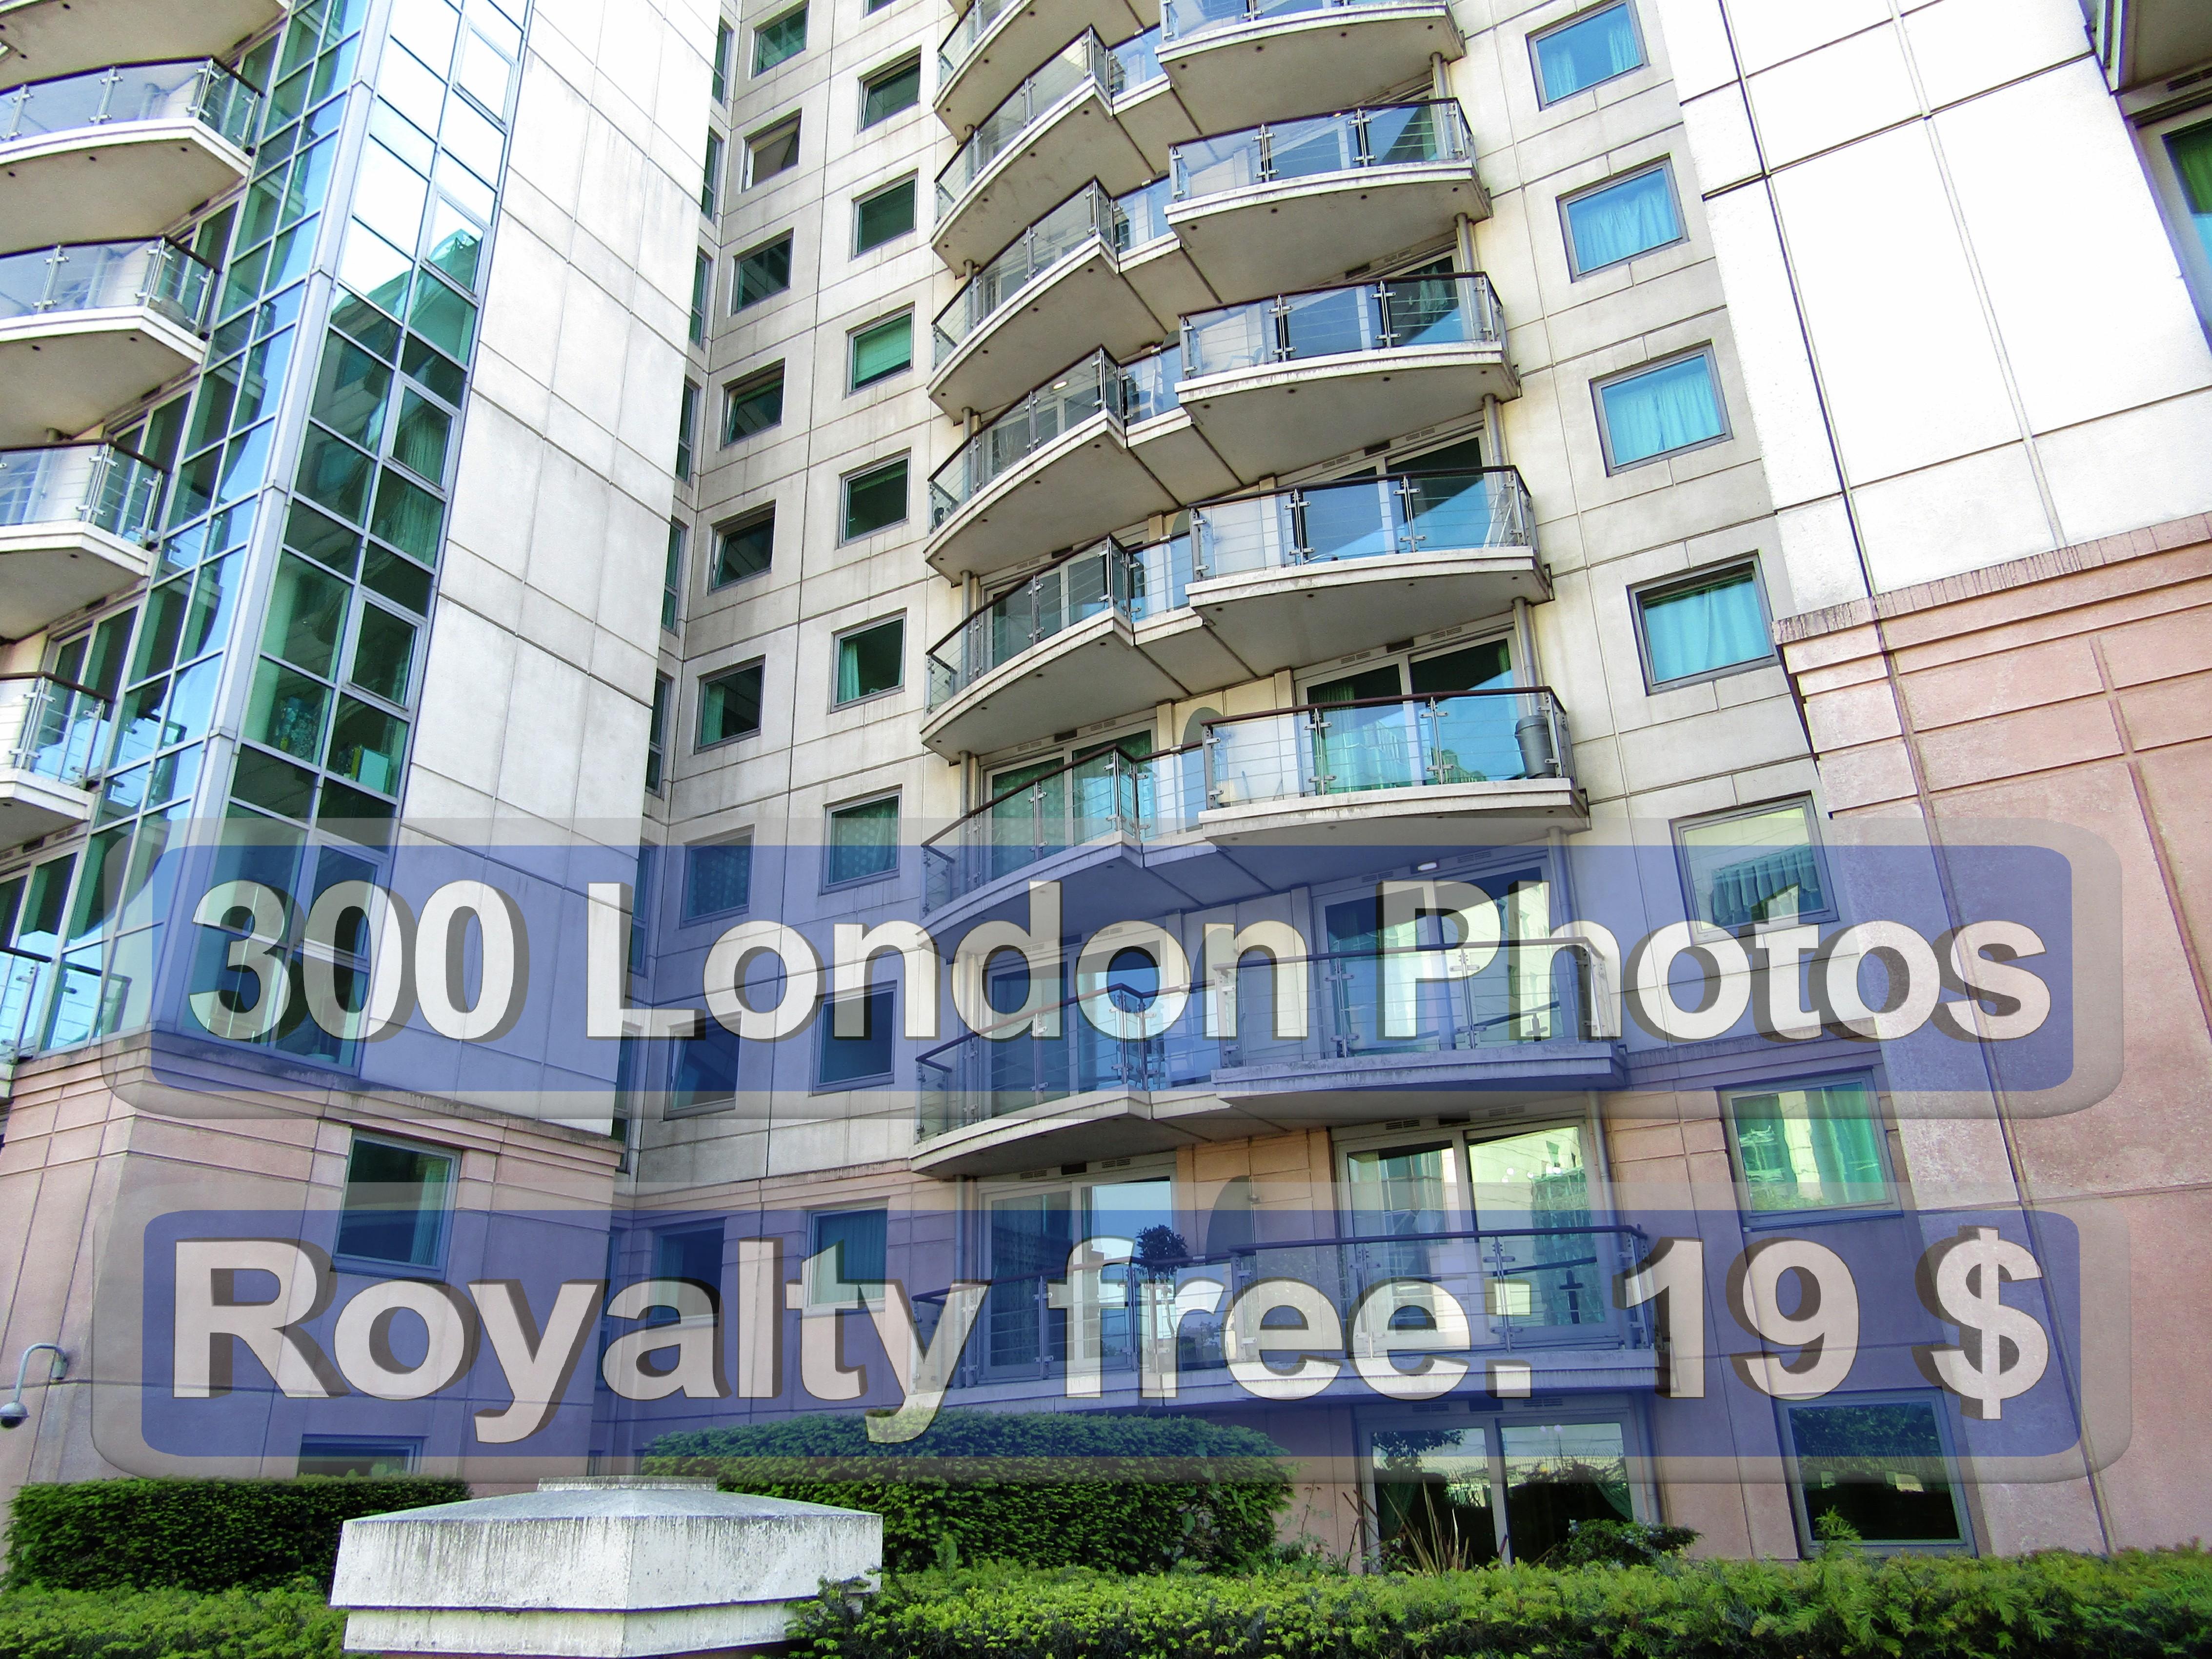 London Photo 360